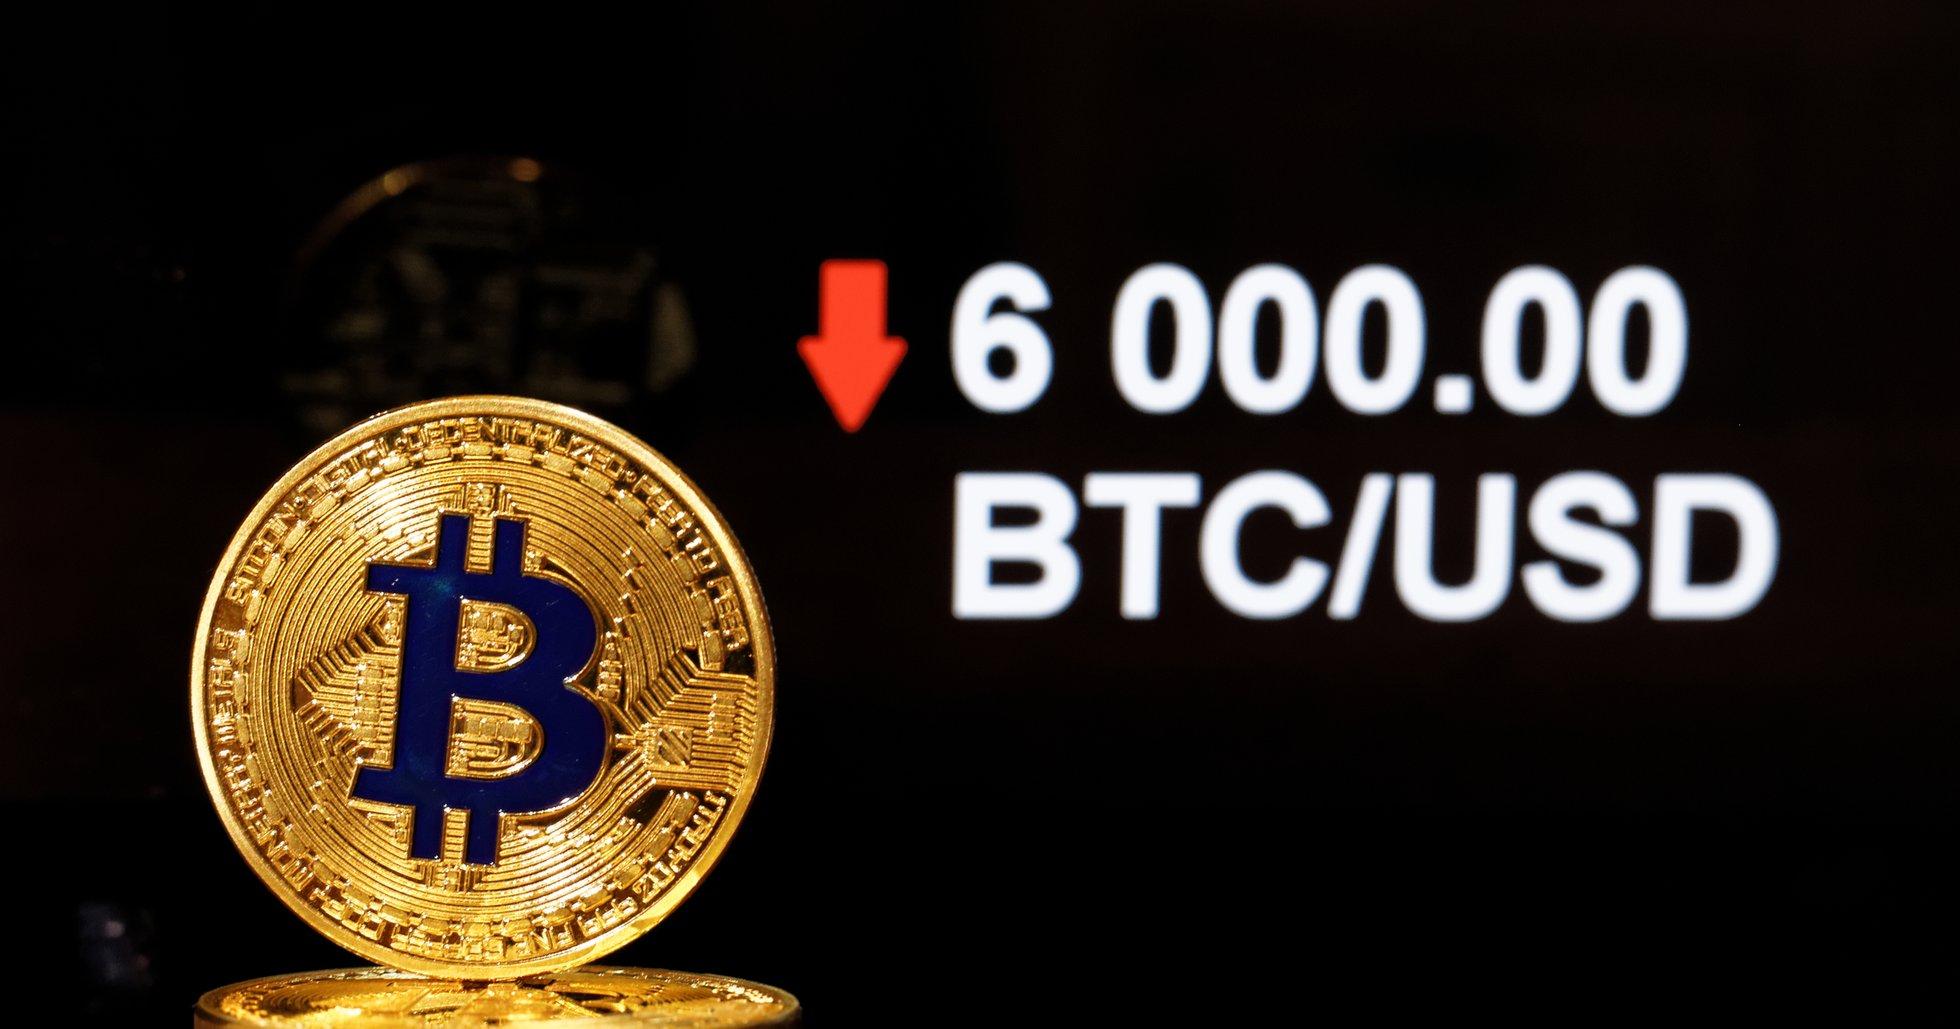 Bitcoinpriset faller 9 procent – men håller sig över 6 000 dollar.